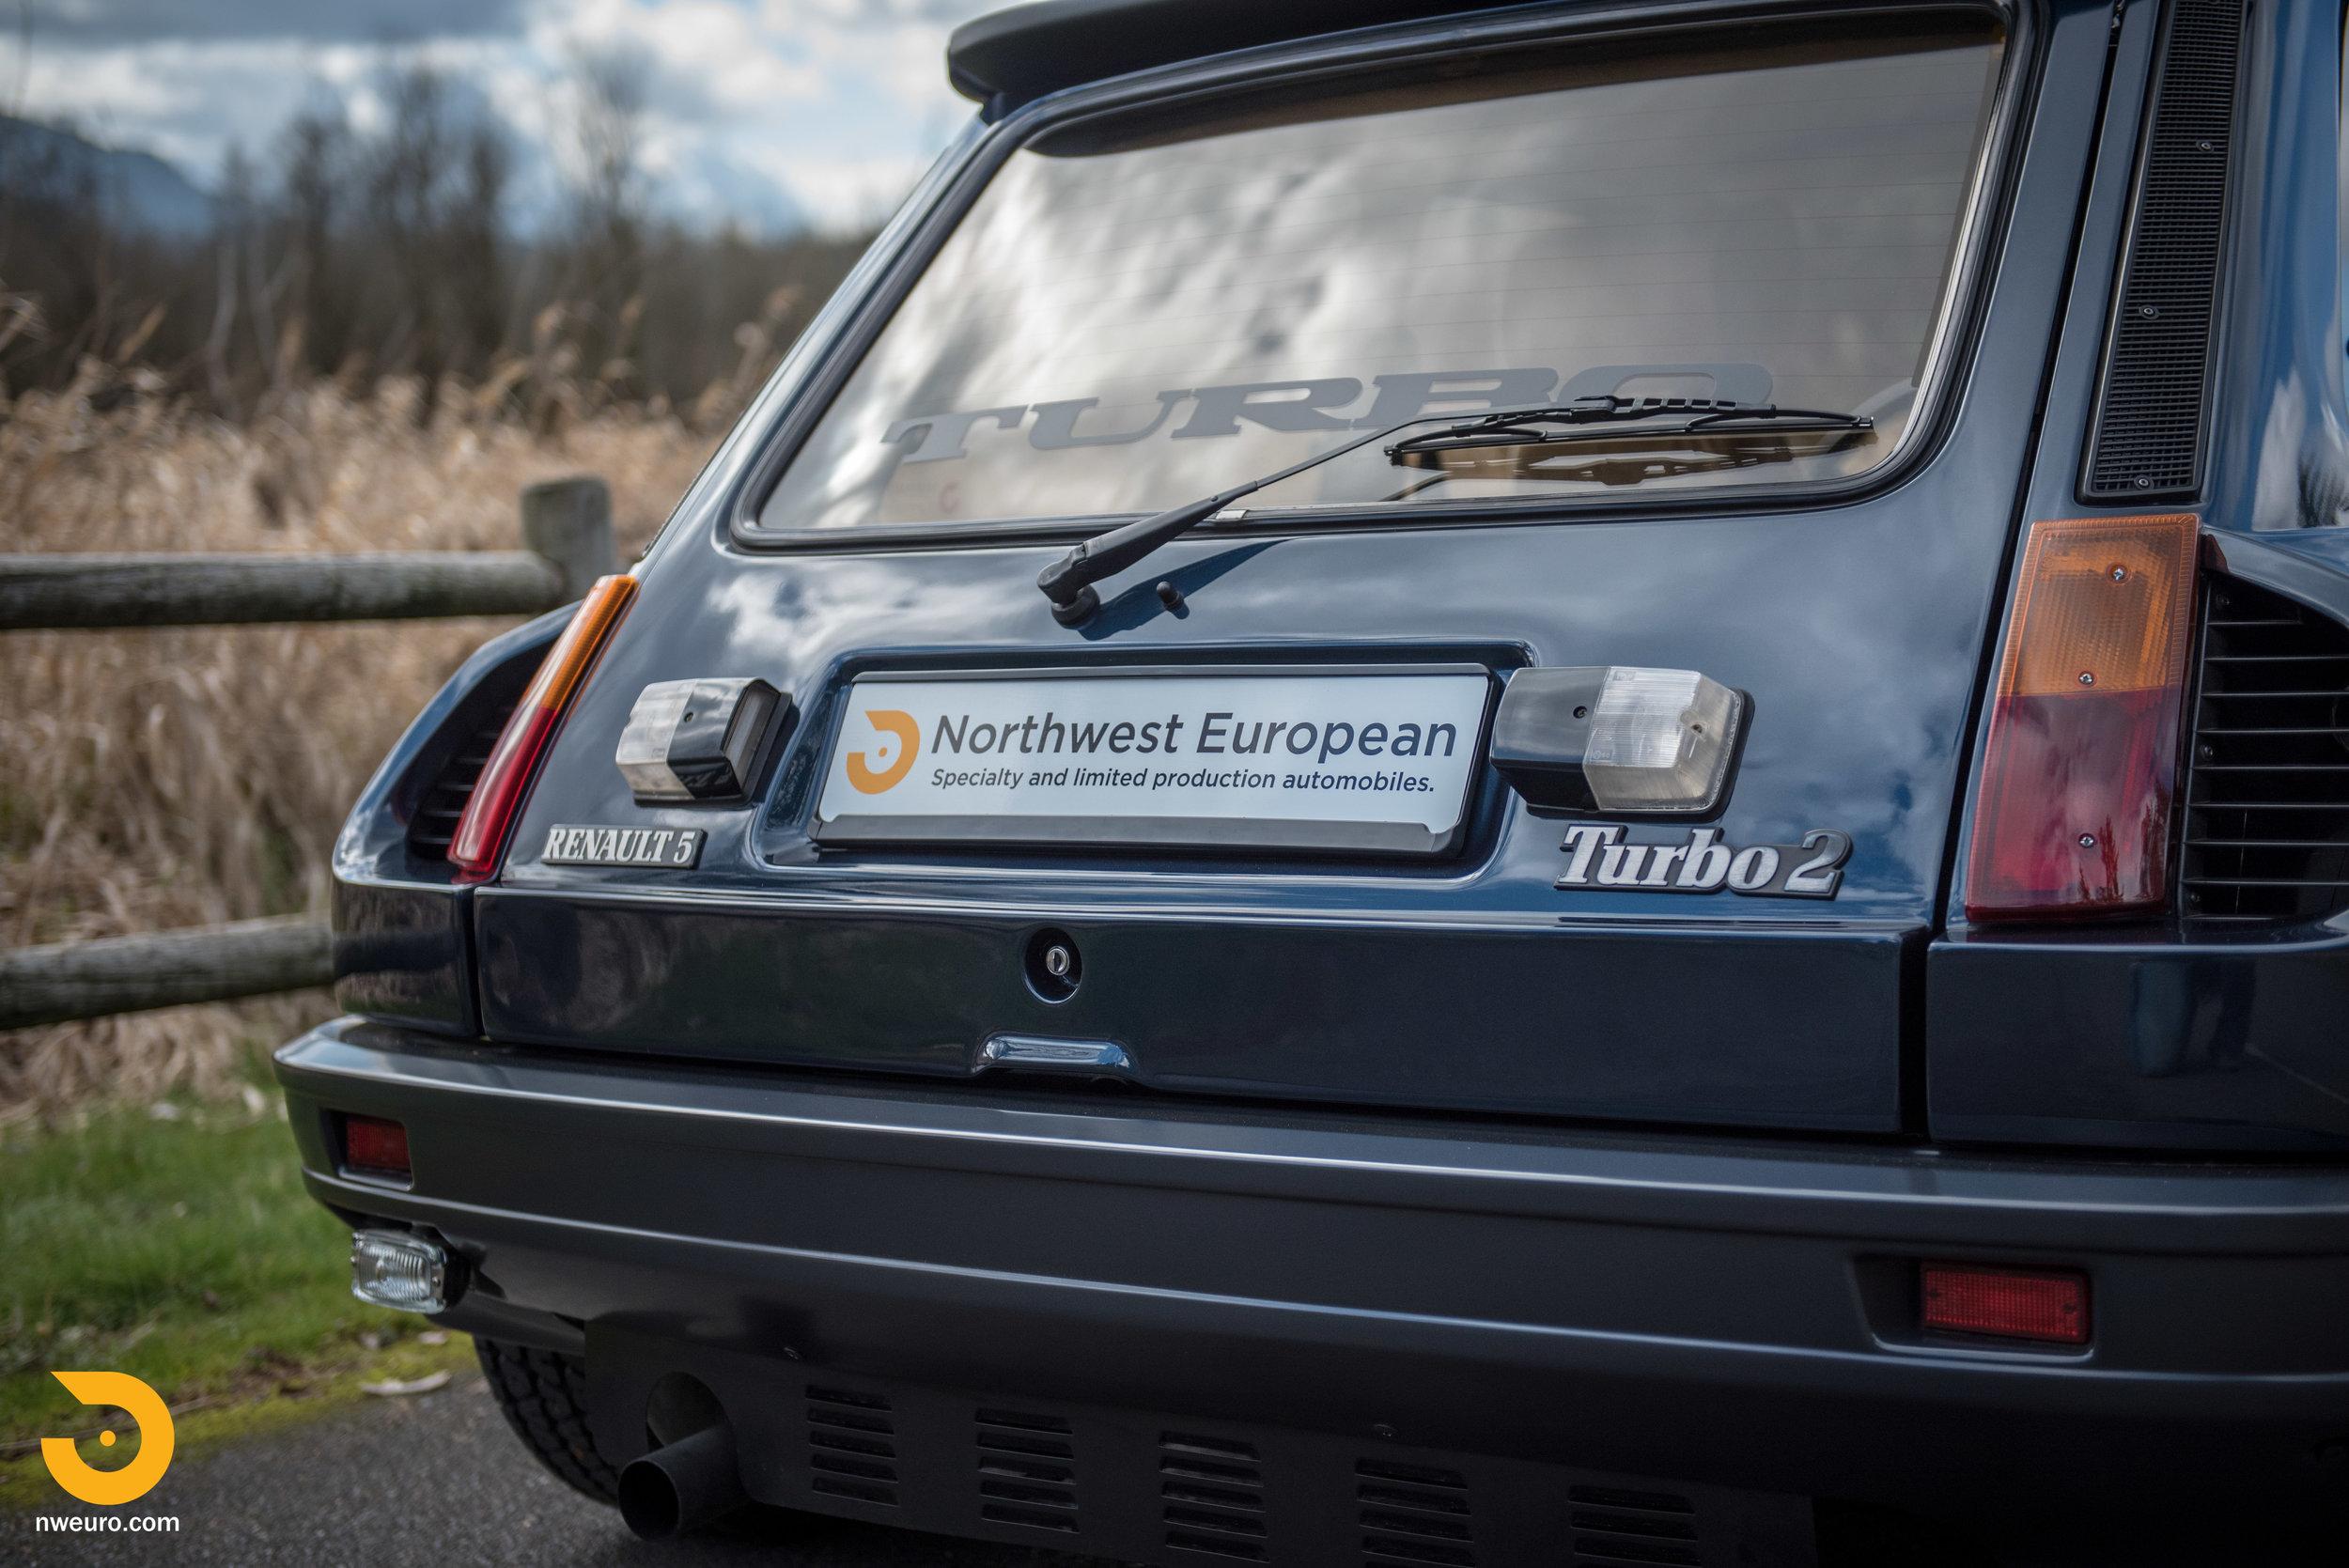 1983 Renault R5 Turbo 2-7.jpg